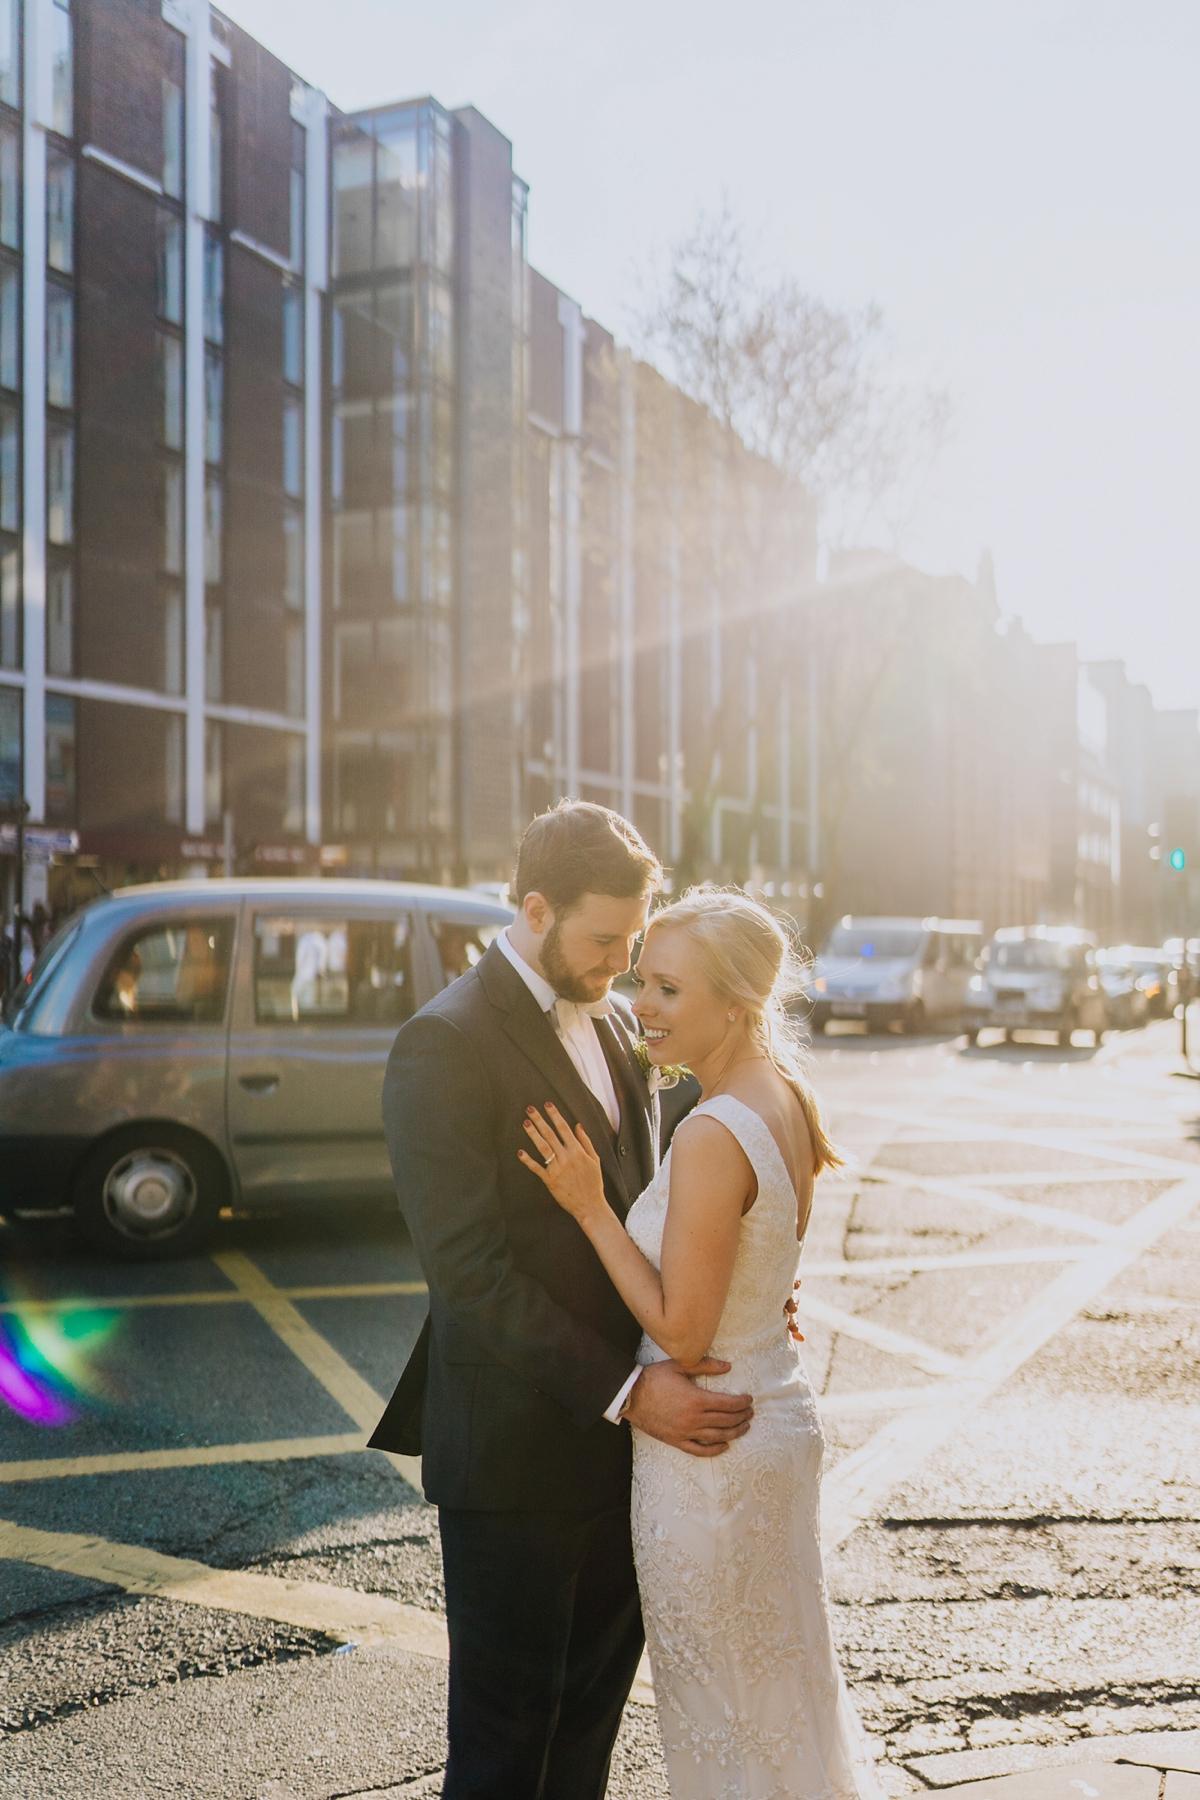 Monsoon Farah Bridal Sleeve Dress Ivory In 2020 Wedding Dresses